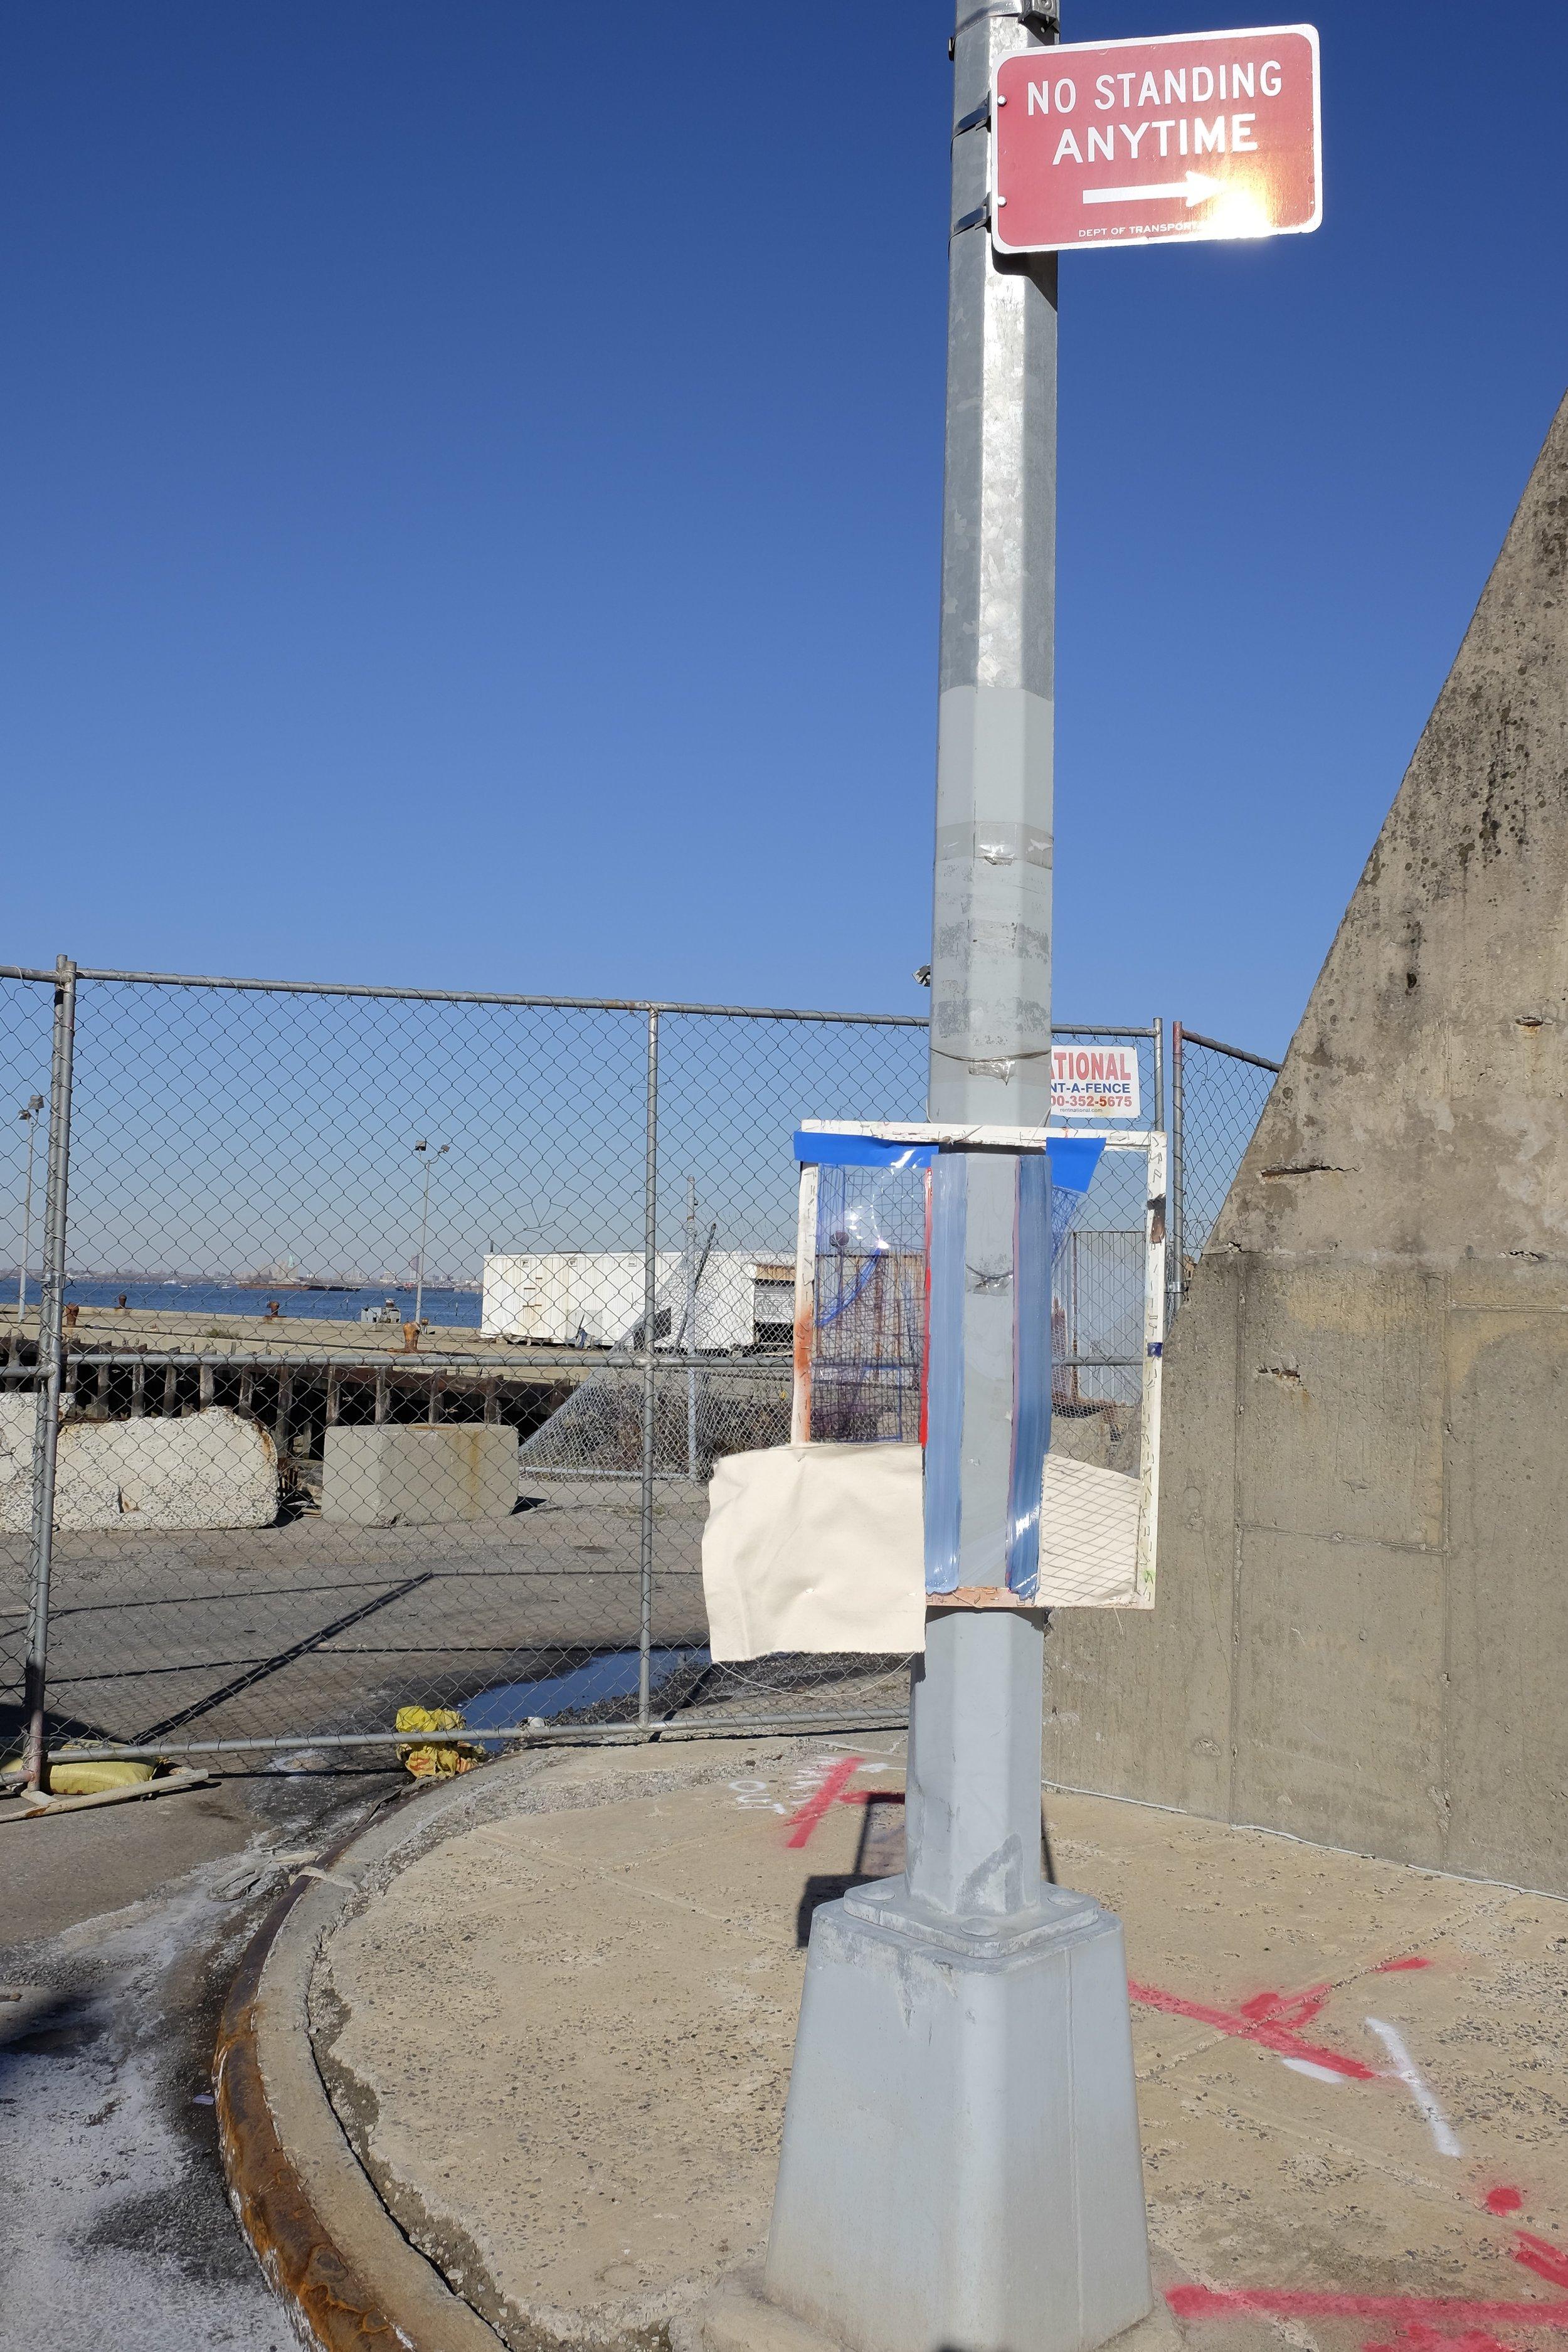 11.21.15 52nd St. Brooklyn Waterfront (Pole)